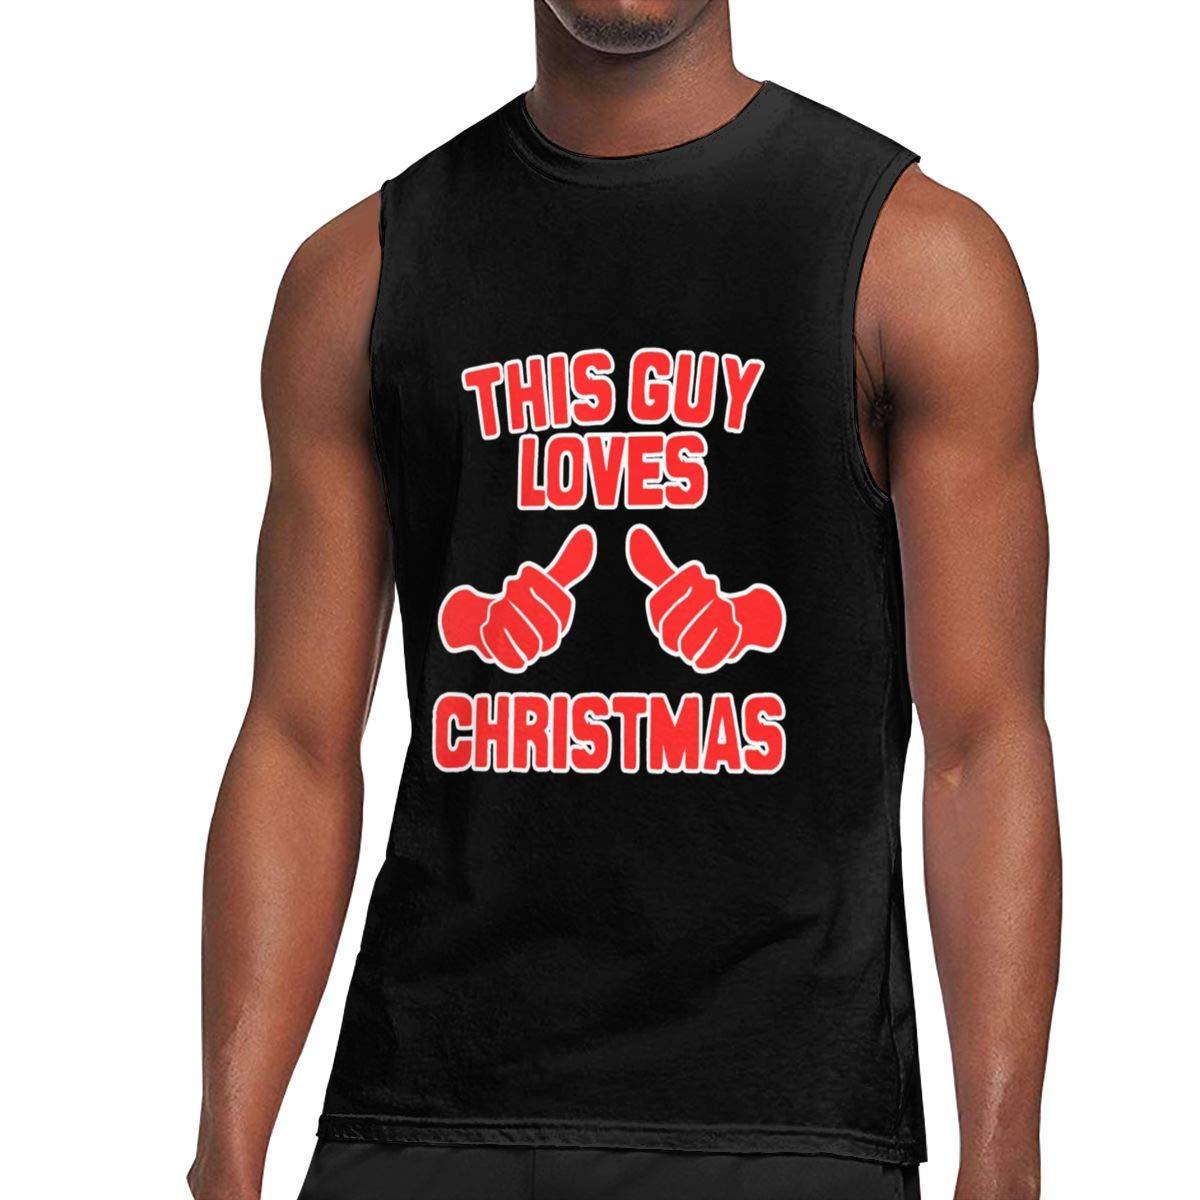 This Guy Loves Christmas Sleeveless Tanks Top Shirt Fit Men